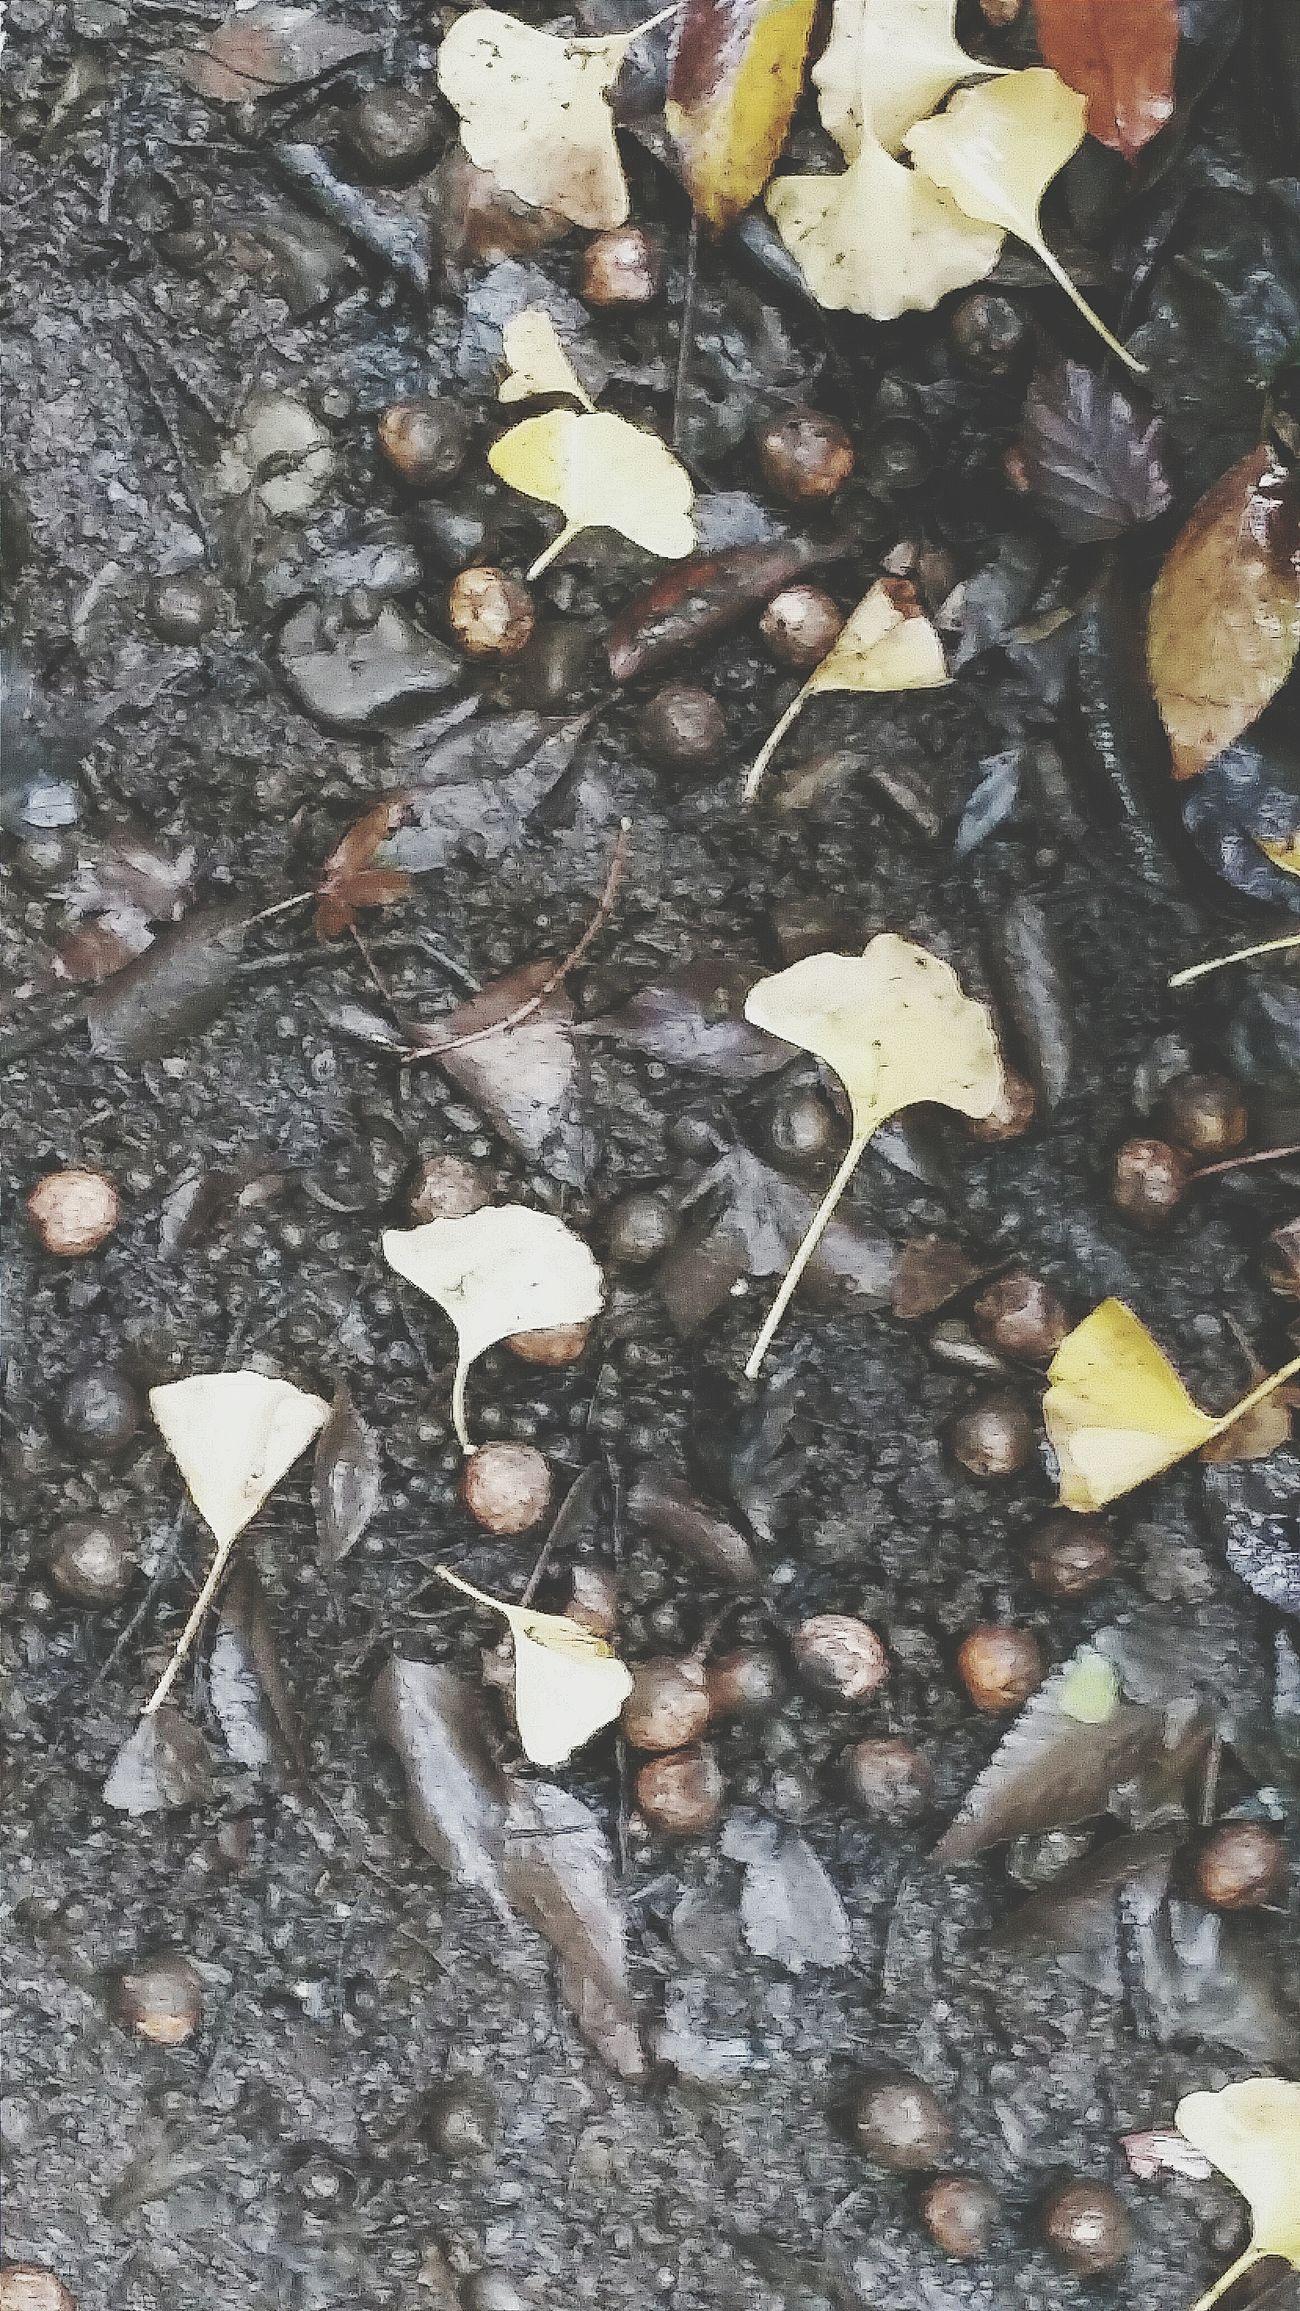 Nuts Seeds Leaves Ginkgo Yellow Autumn Colors Autumn 2015 Fall Autumn 秋 Tokyo Autumn 2015 Seasons EyeEm Nature Lover Naturelover Nature Photography Nature_collection Enjoying Tokyo Tokyo Nature Urban Nature Tokyo Japan Koishikawa Korakuen Travelphotography